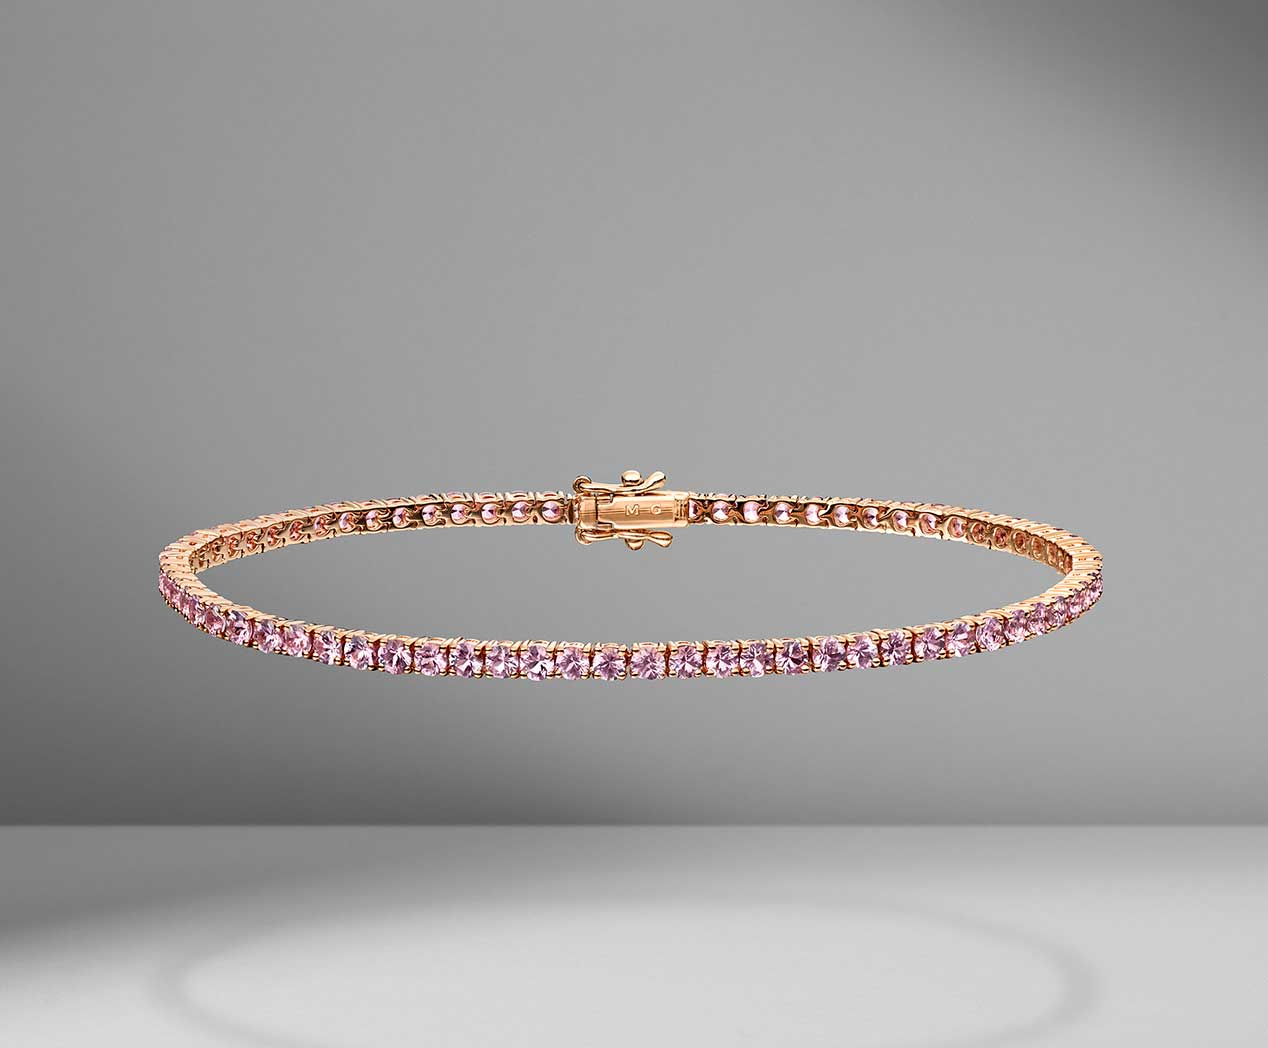 mg-bracelet-101753-rg---Teresa-Panico.jpg